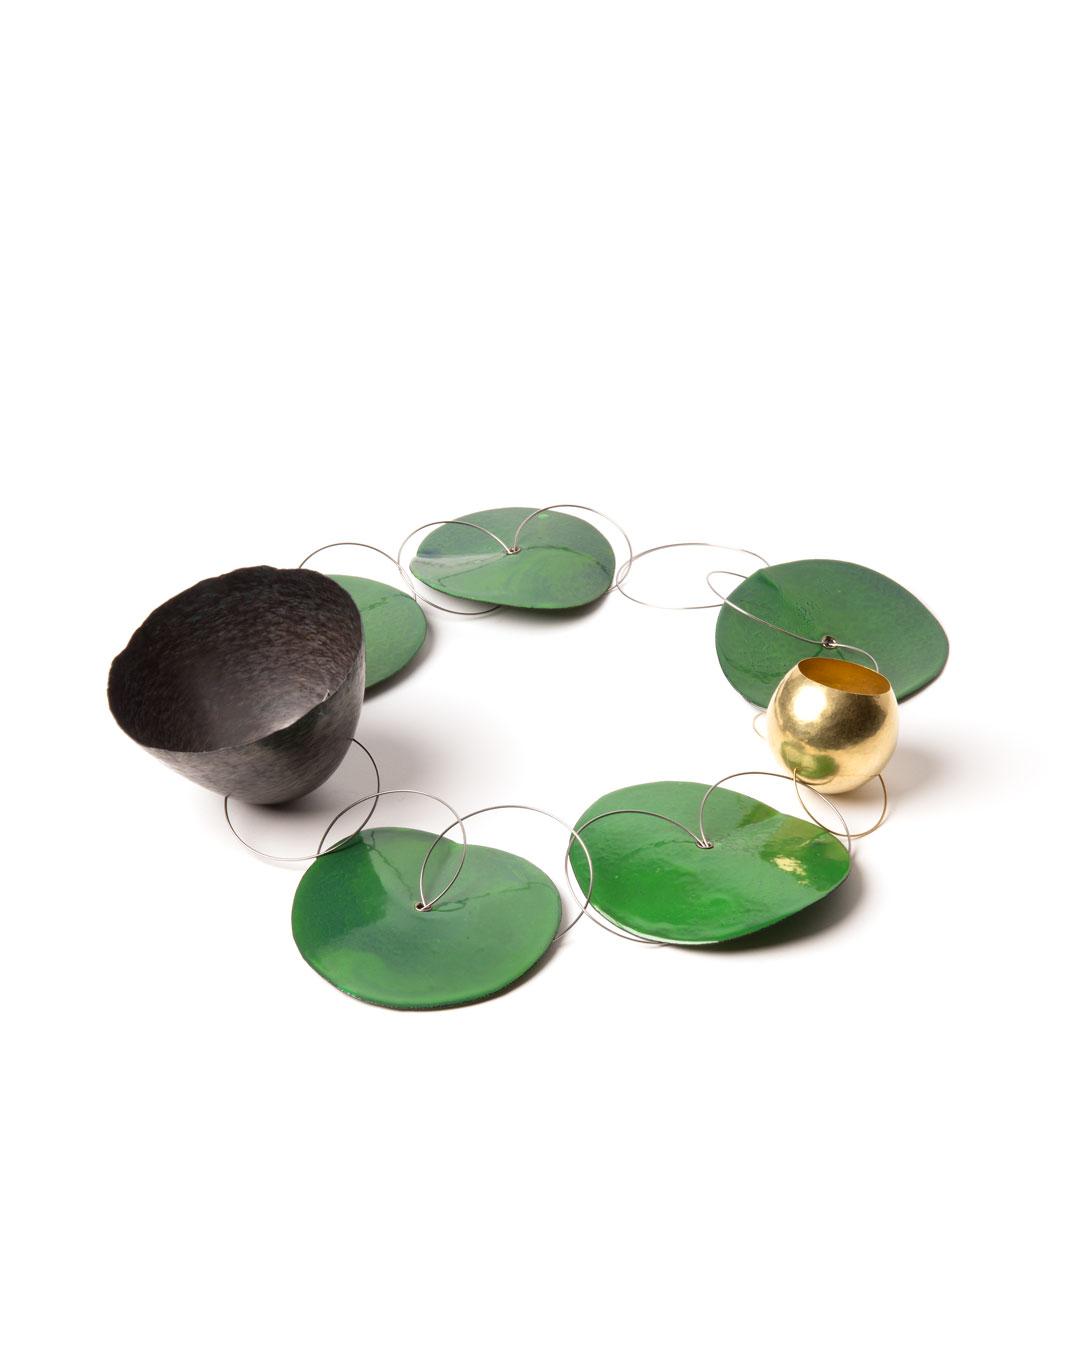 Andrea Wippermann, Garten - Die Nacht (Garden – The Night), 2015, necklace; gold, titanium, enamelled steel, stainless steel, silver, D 90 mm, H 60 mm, €9500